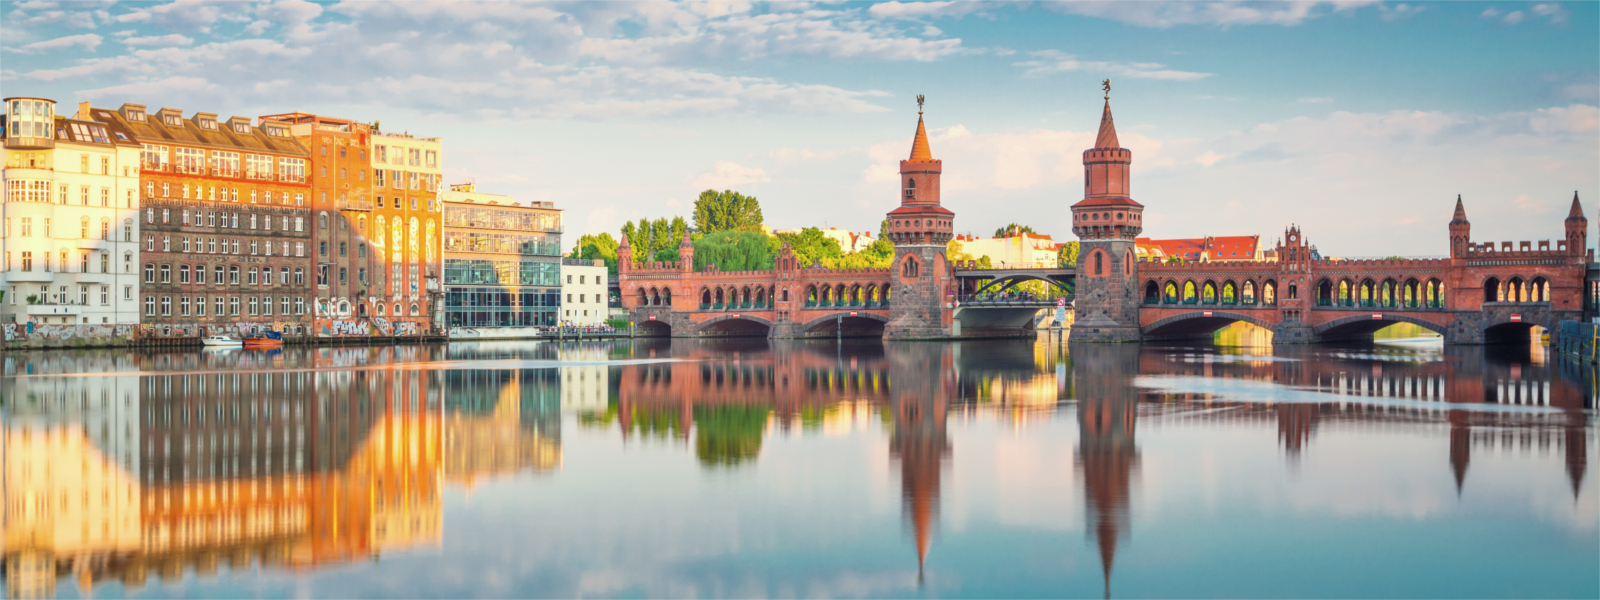 Oberbaumbrücke over de Spree in Berlijn